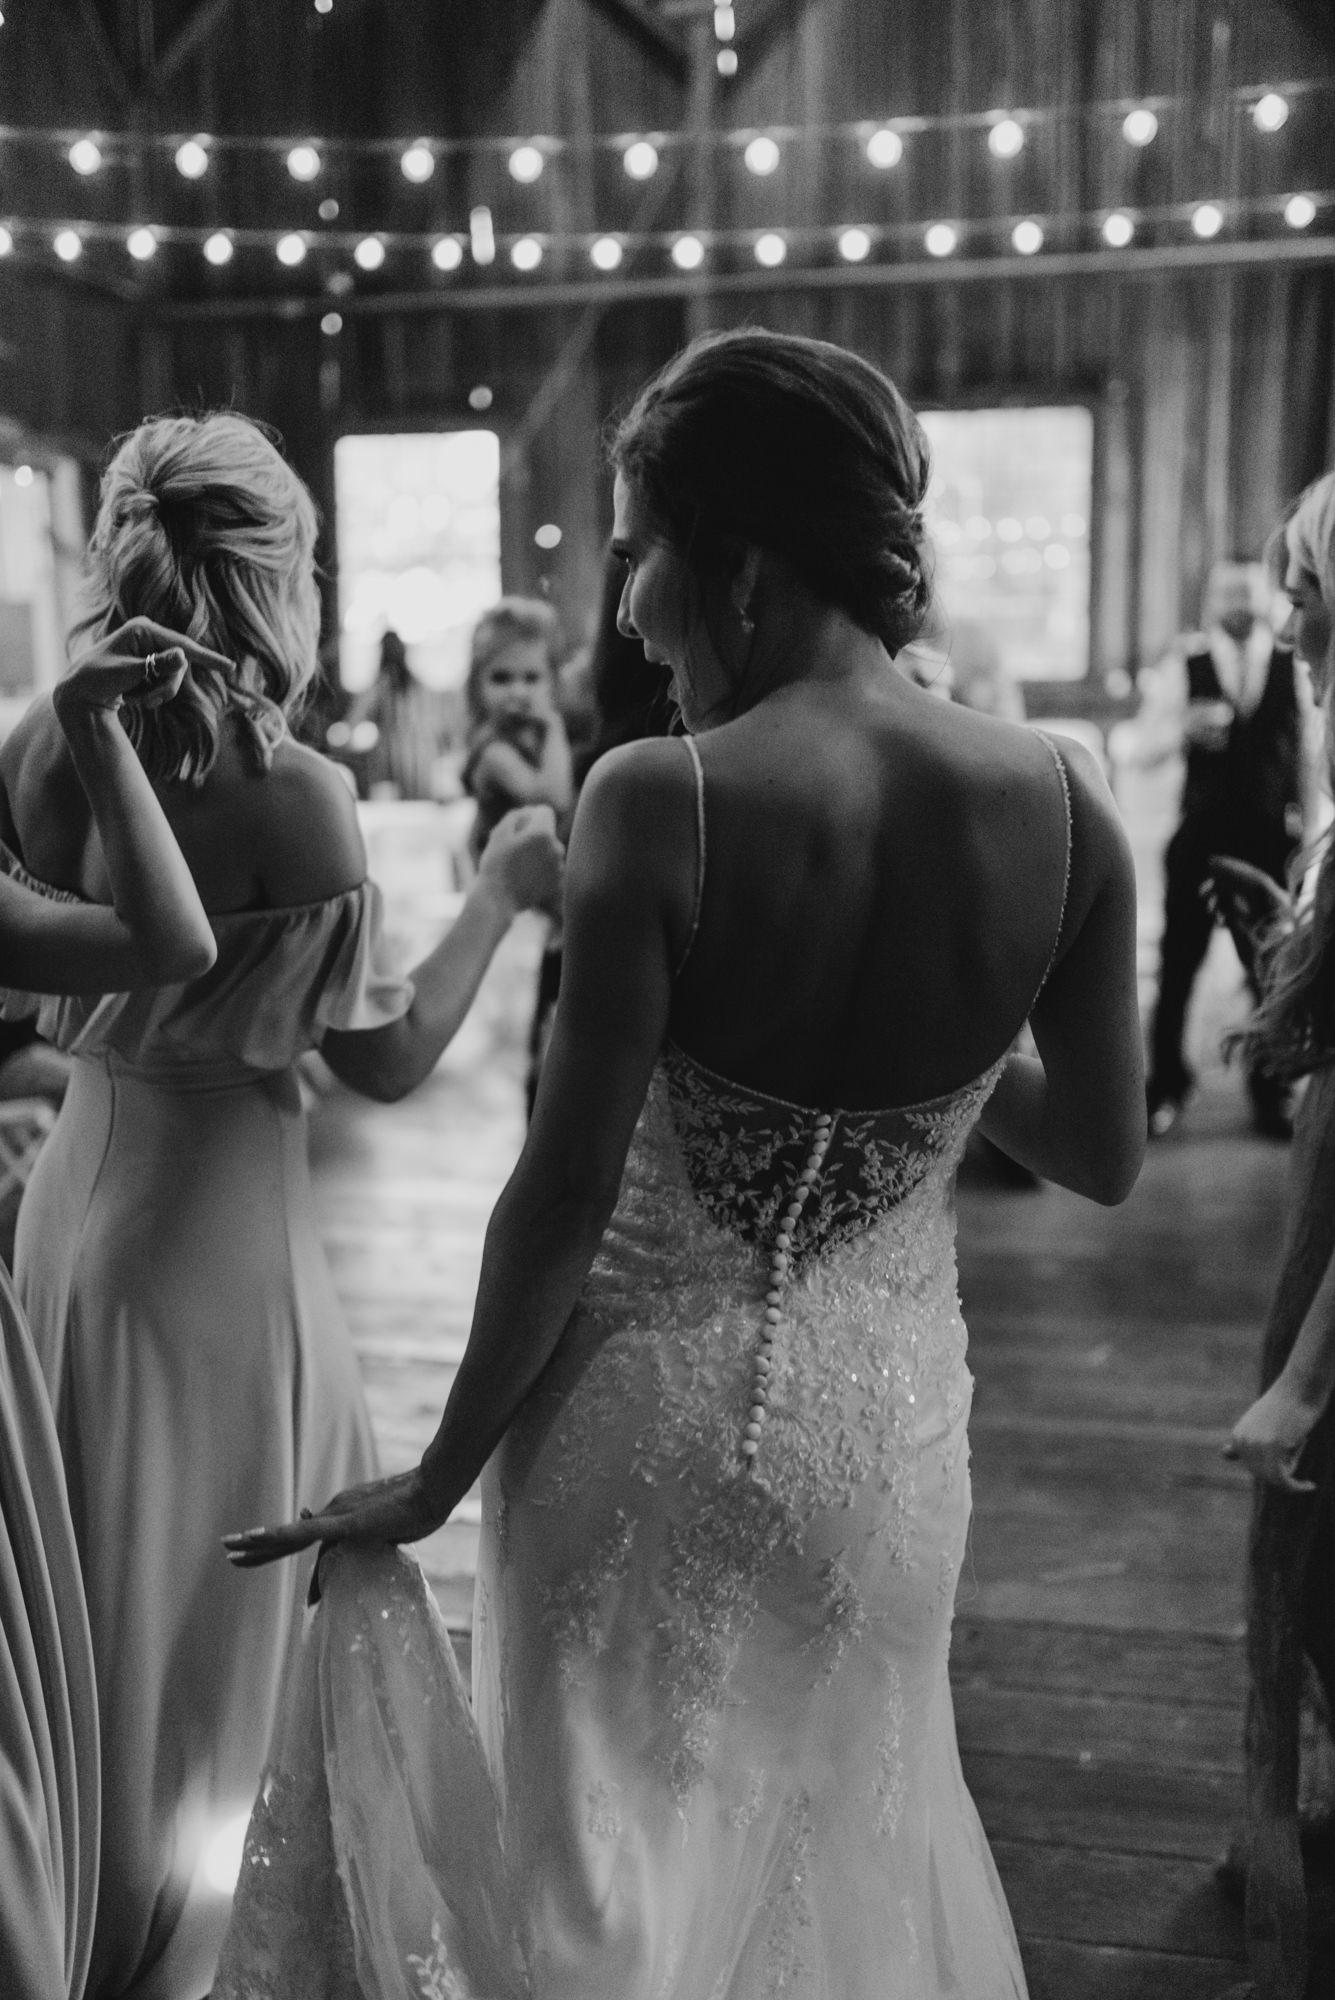 200-portland-northwest-wedding-bubble-exit-barn-string-lights.jpg